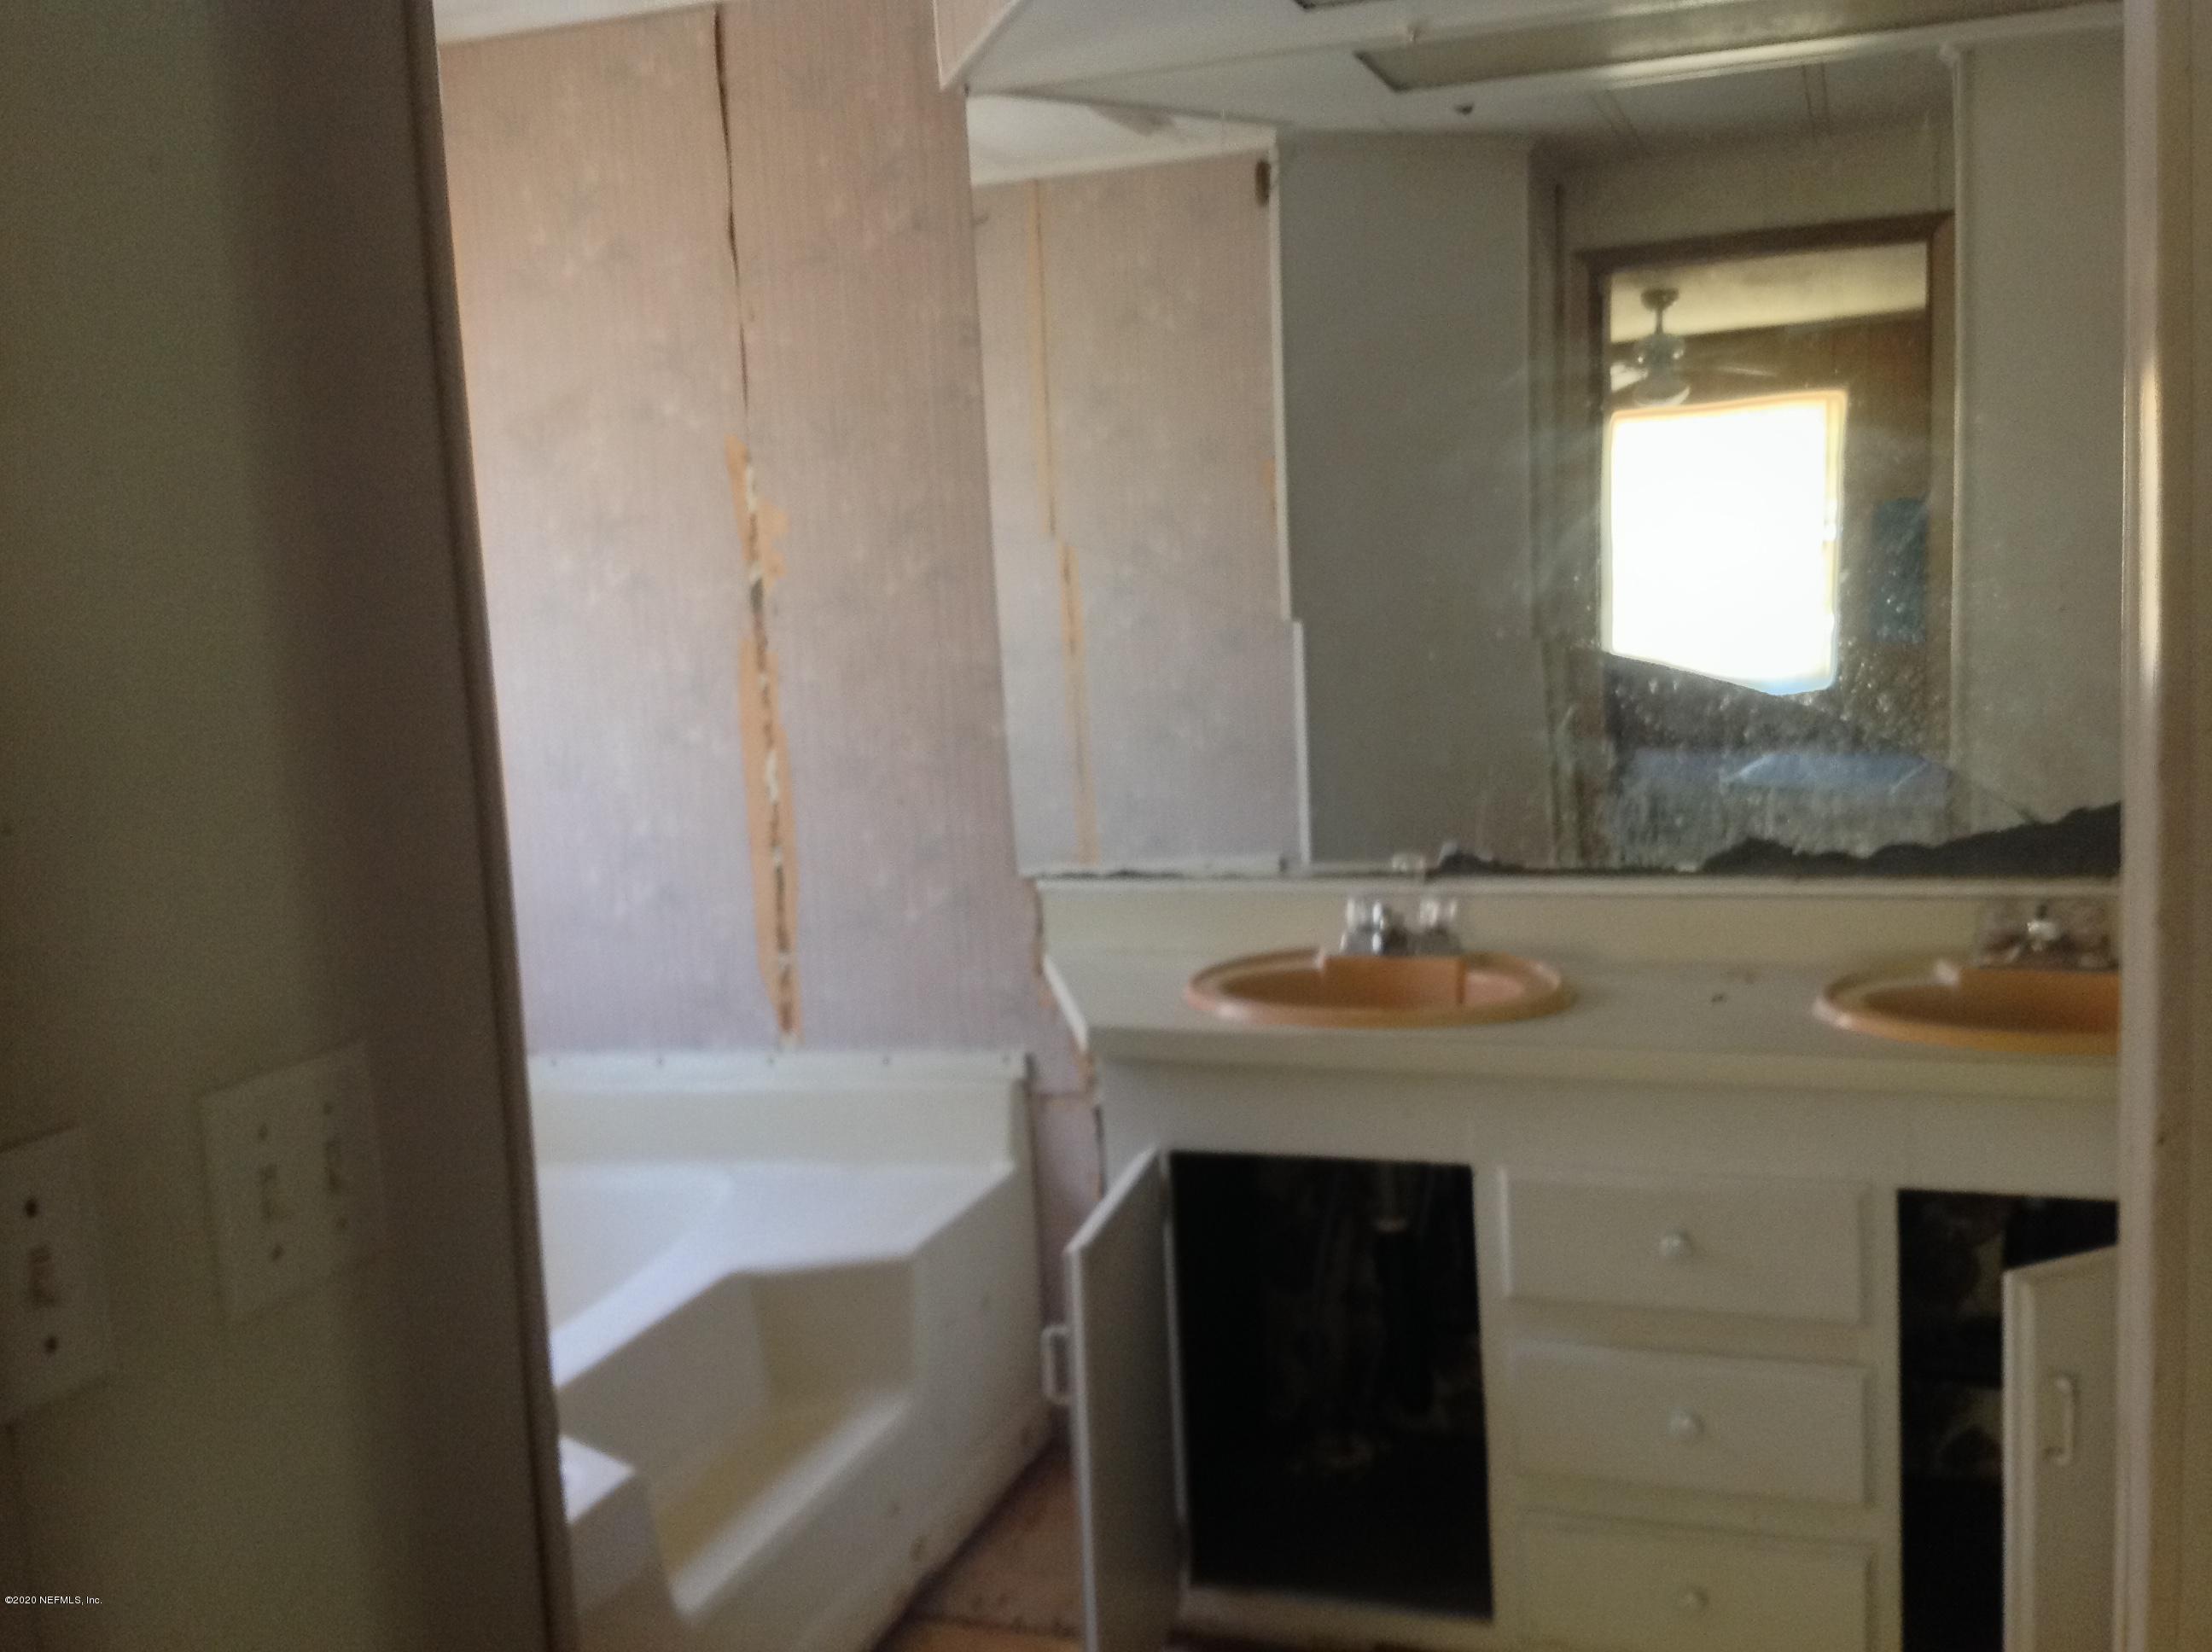 2299 CARNATION, MIDDLEBURG, FLORIDA 32068, 3 Bedrooms Bedrooms, ,2 BathroomsBathrooms,Residential,For sale,CARNATION,1054633